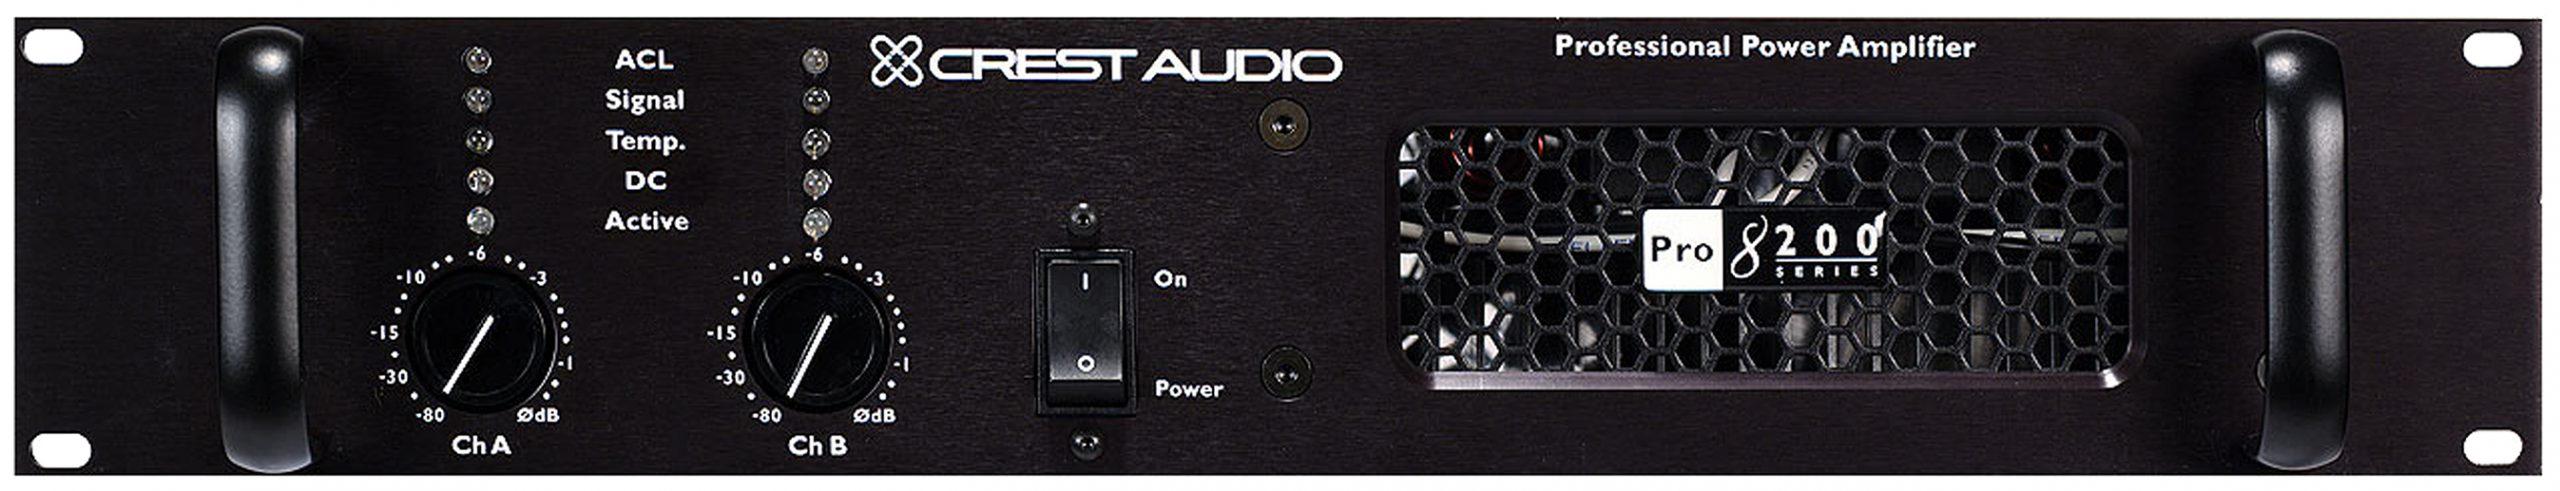 Image result for crest audio pro 8200